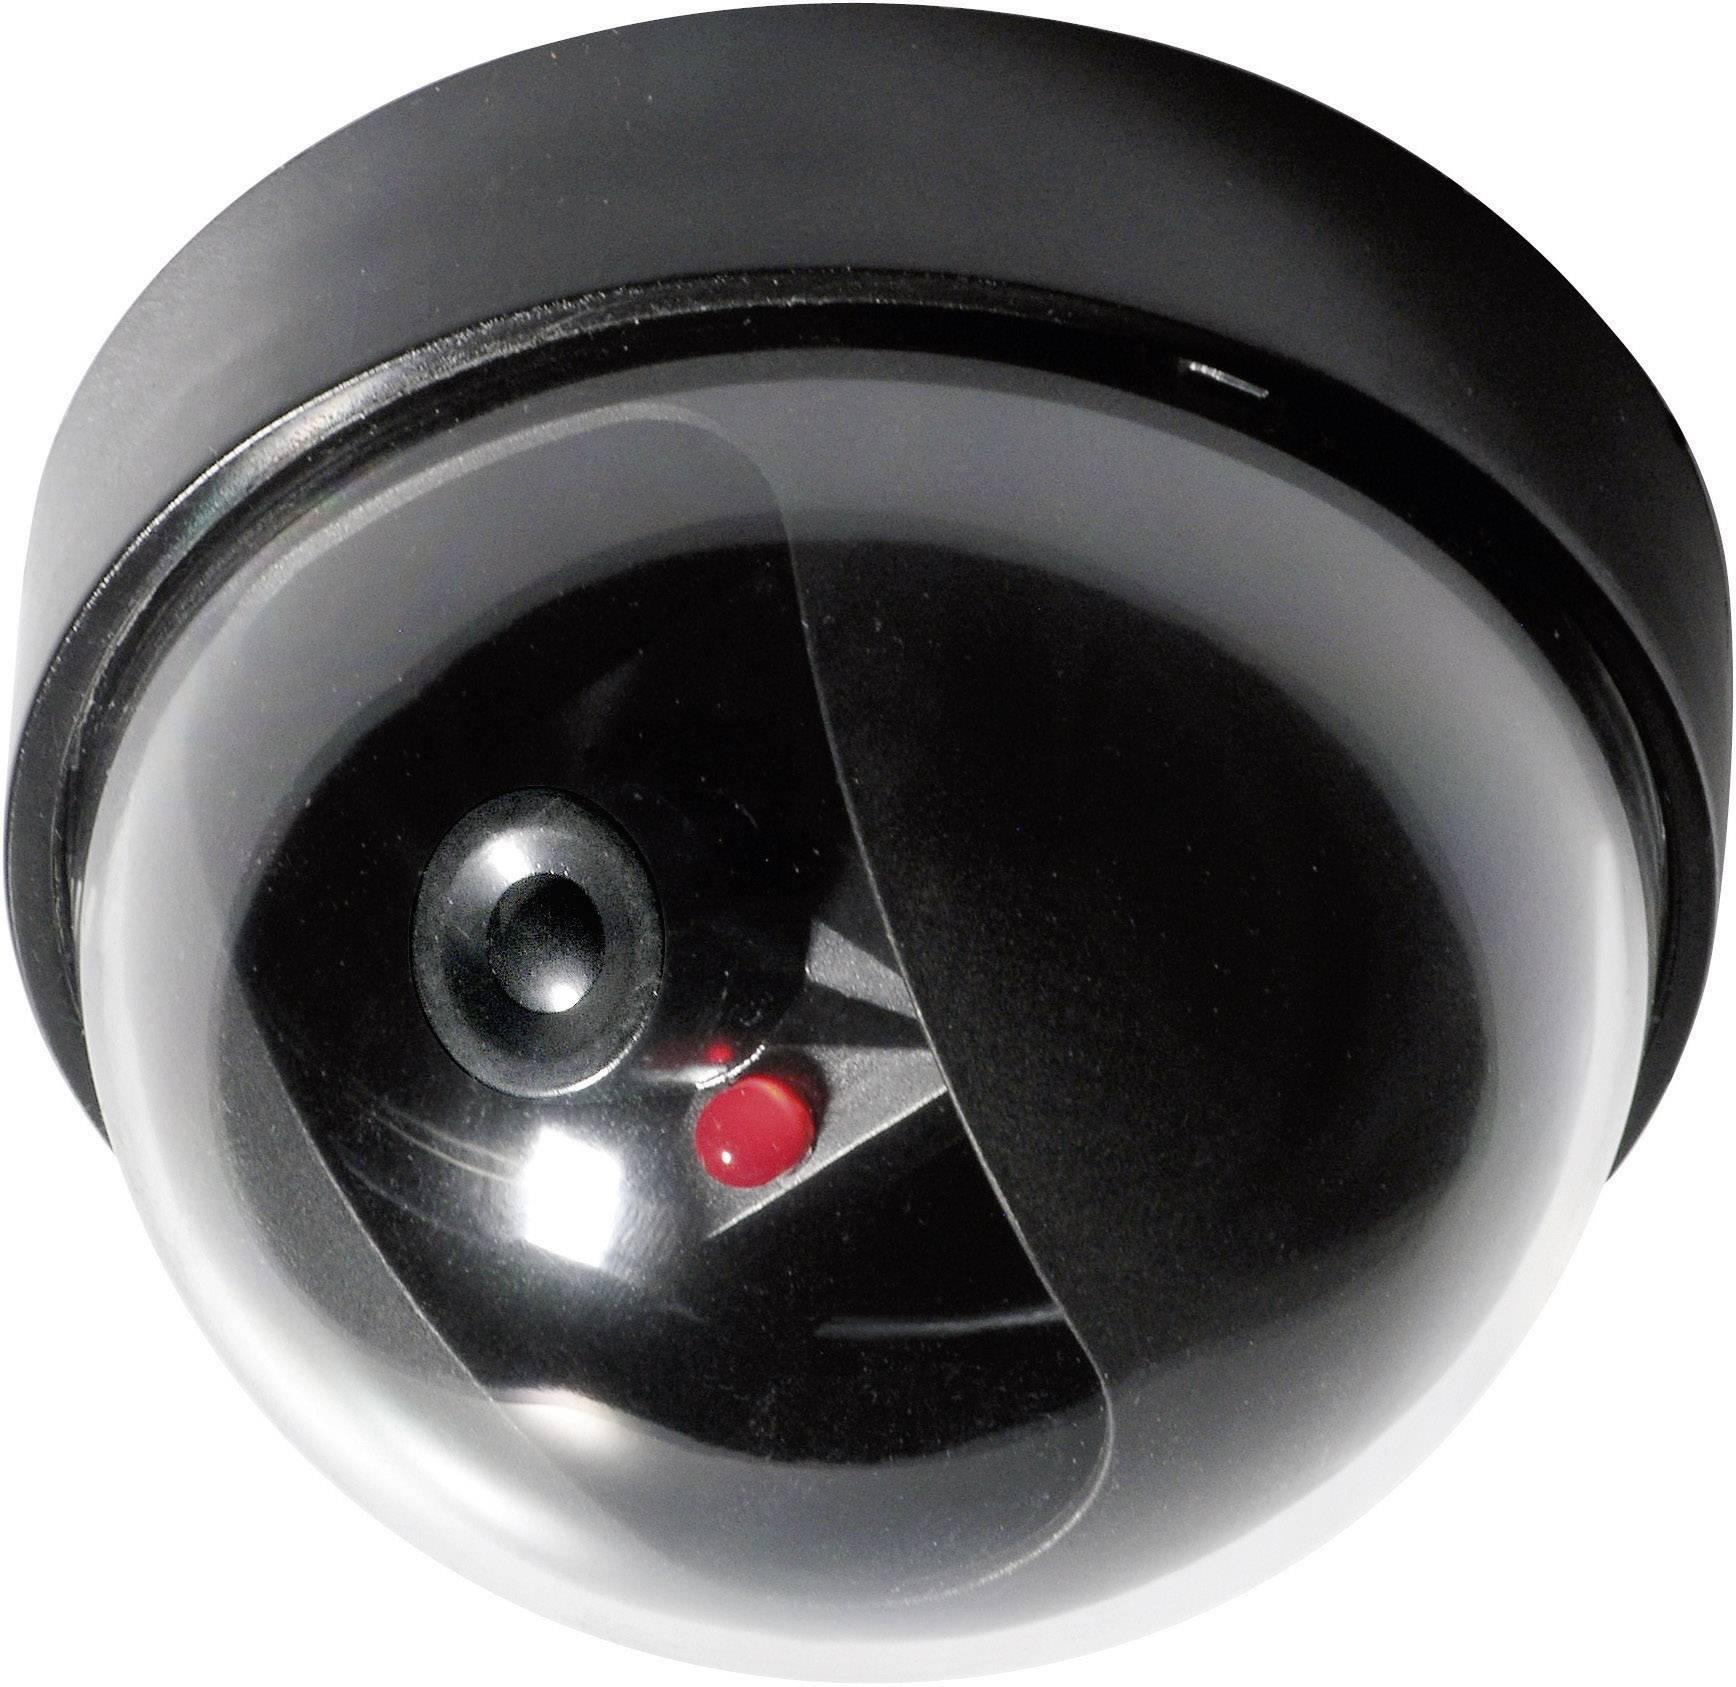 Atrapa kamery s blikajúcou LED diódou 24227